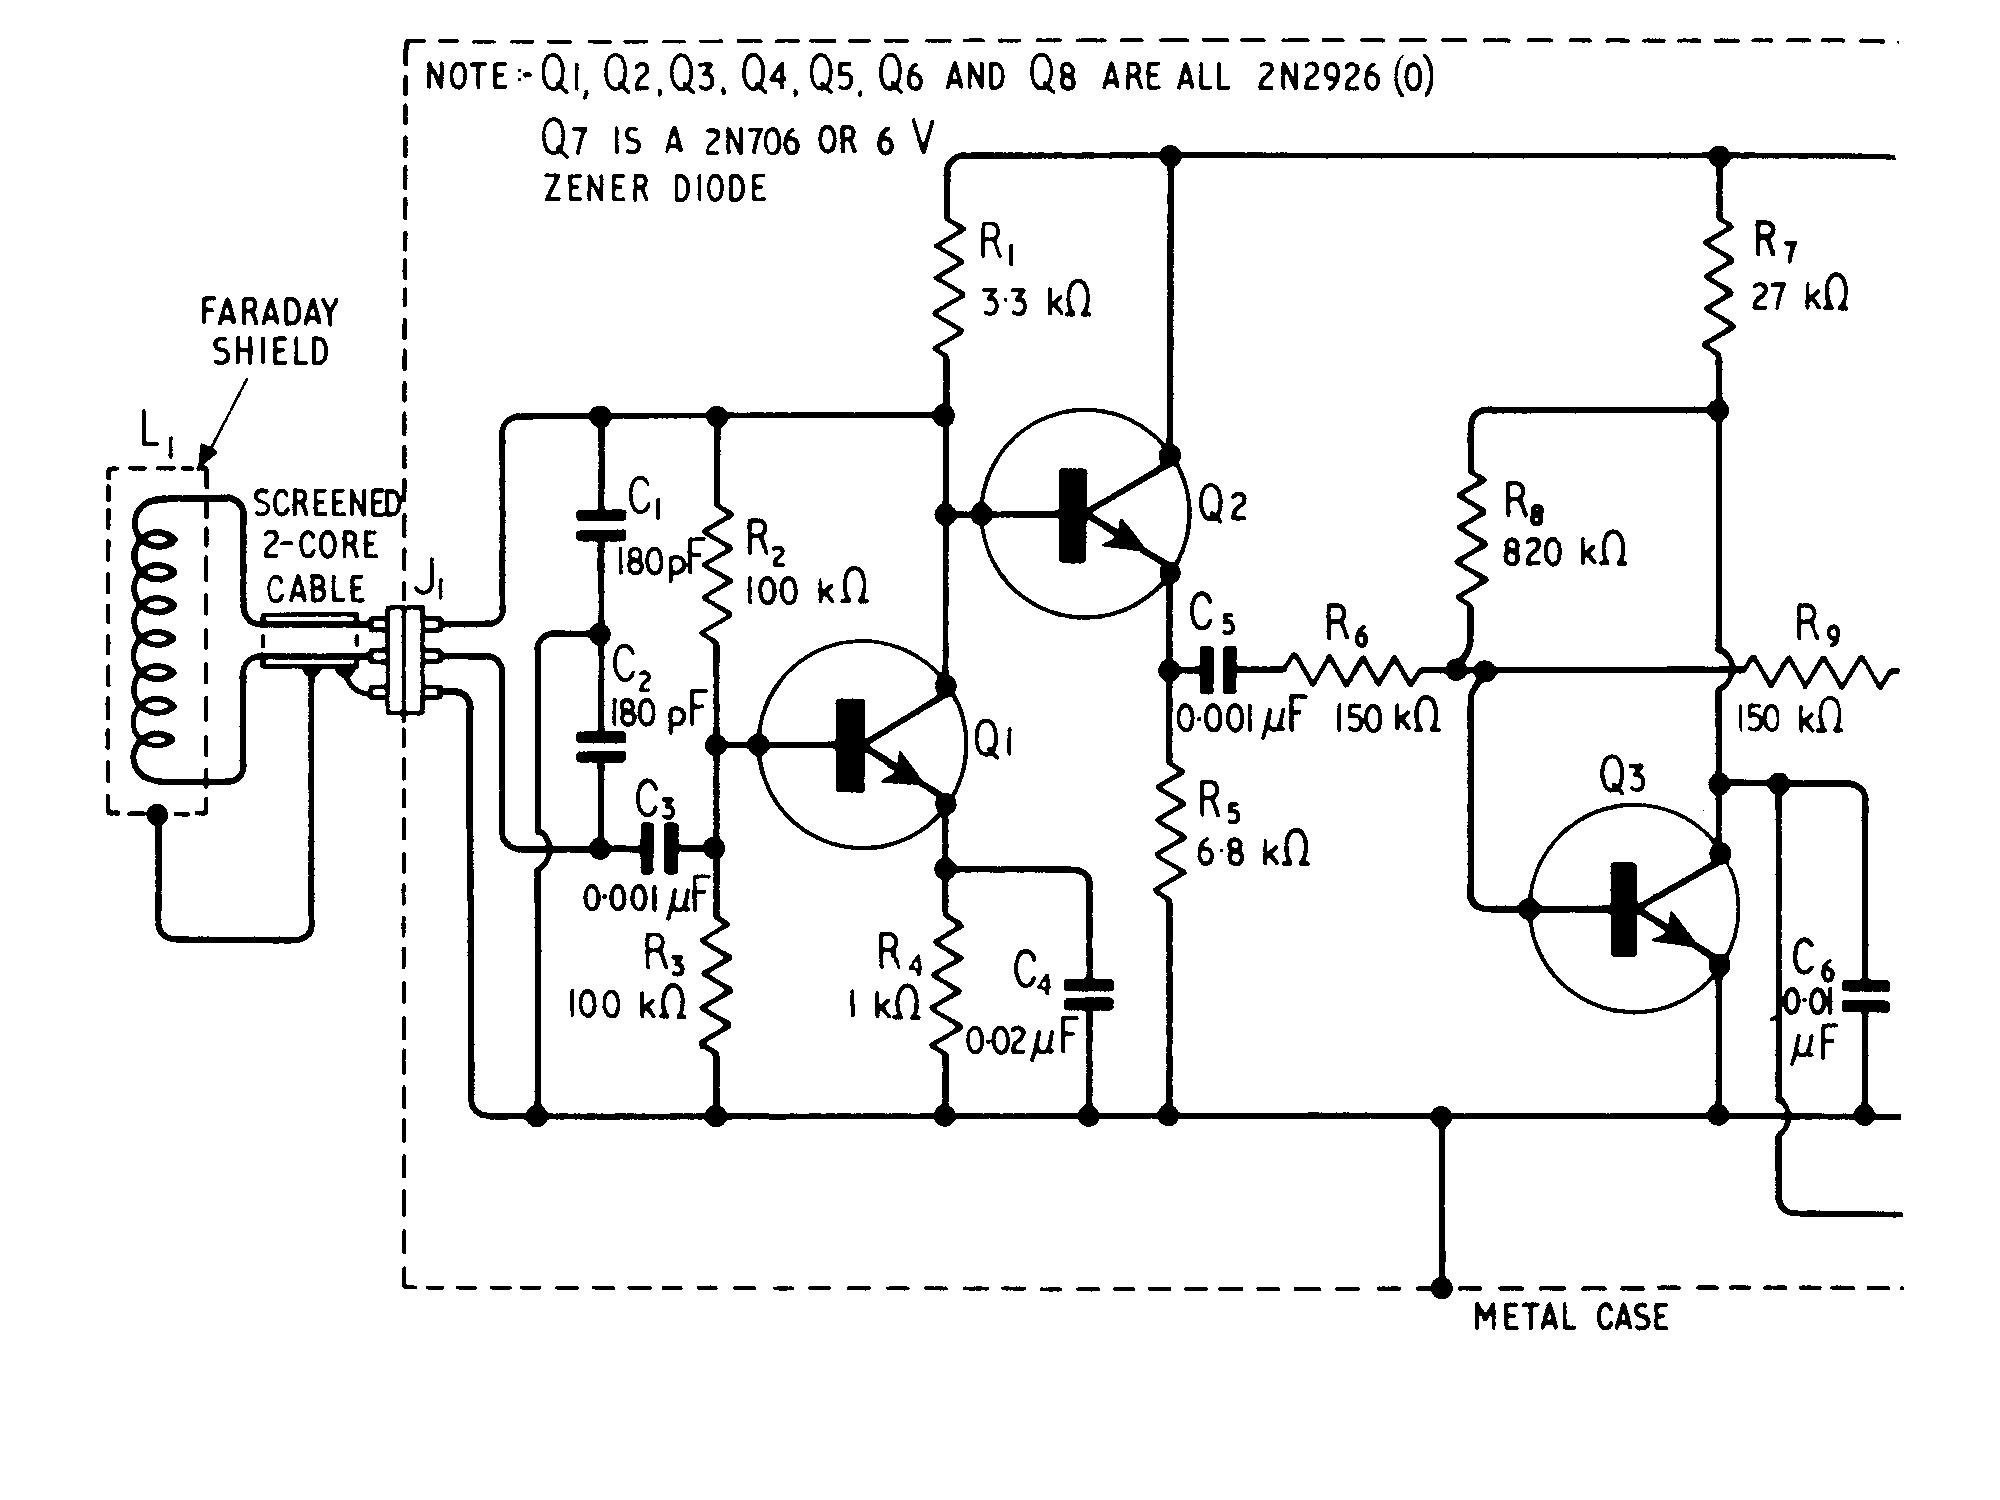 sensors_marston-sspfth-project20-metal-detector-schematic-left-2000x1500.png